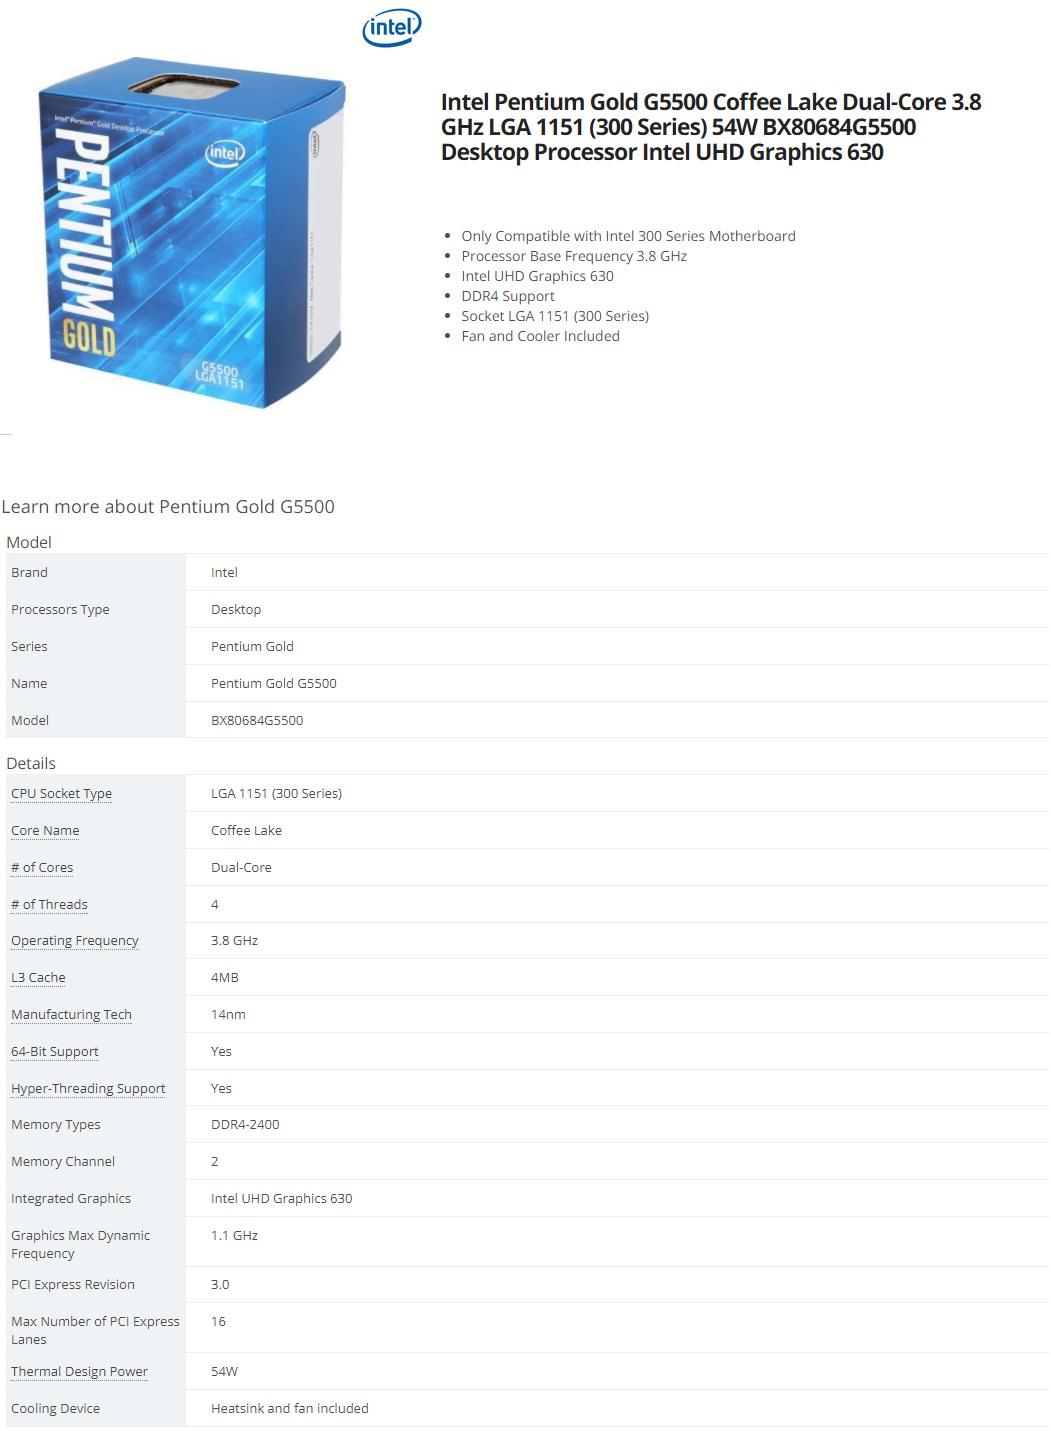 Intel Pentium Gold G5500 Coffee Lake Dual-Core 3.8 GHz LGA 1151 BX80684G5500